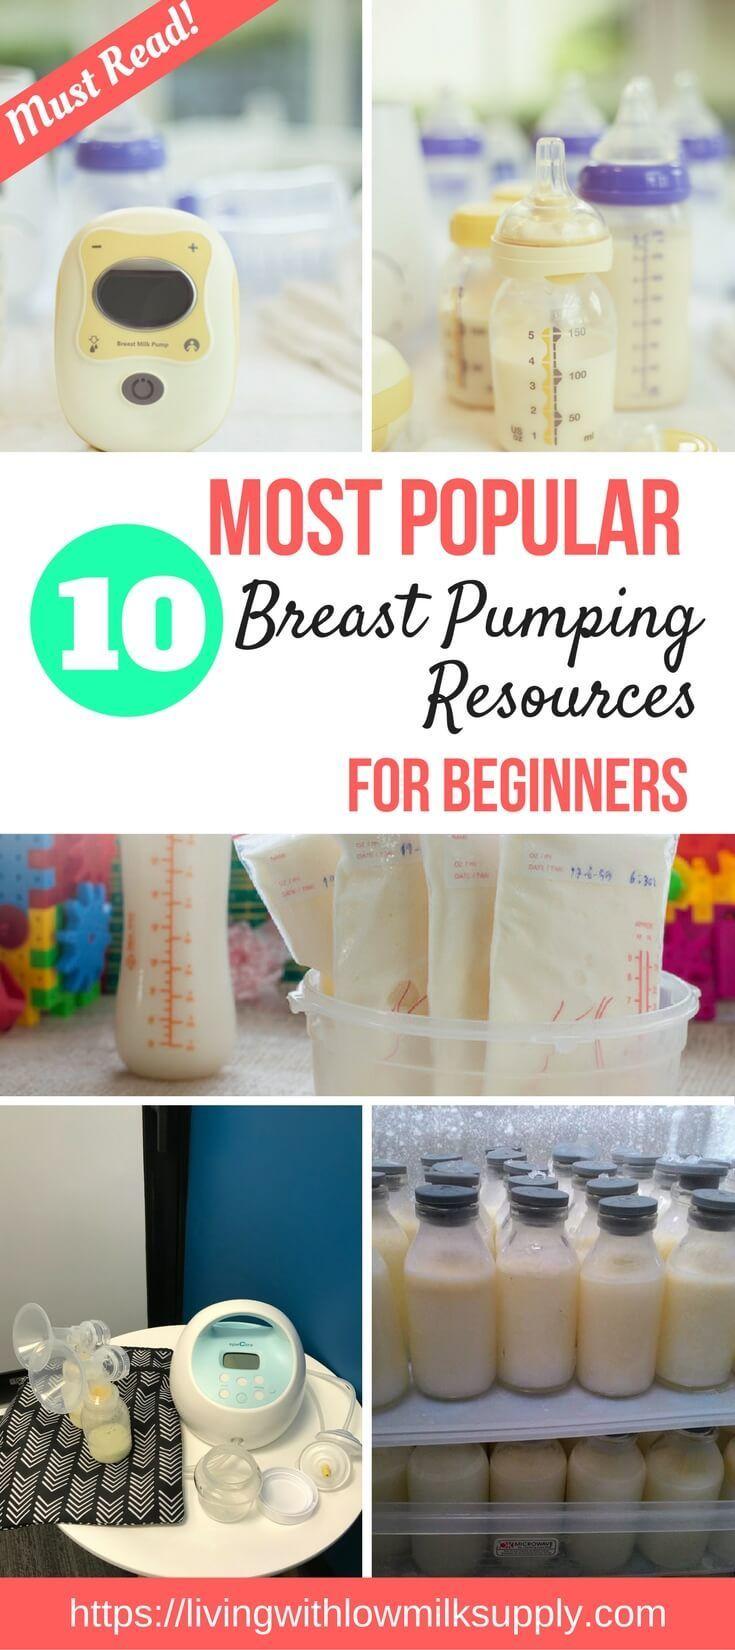 640 Best Breastfeeding Images On Pinterest  Breastfeeding -7697